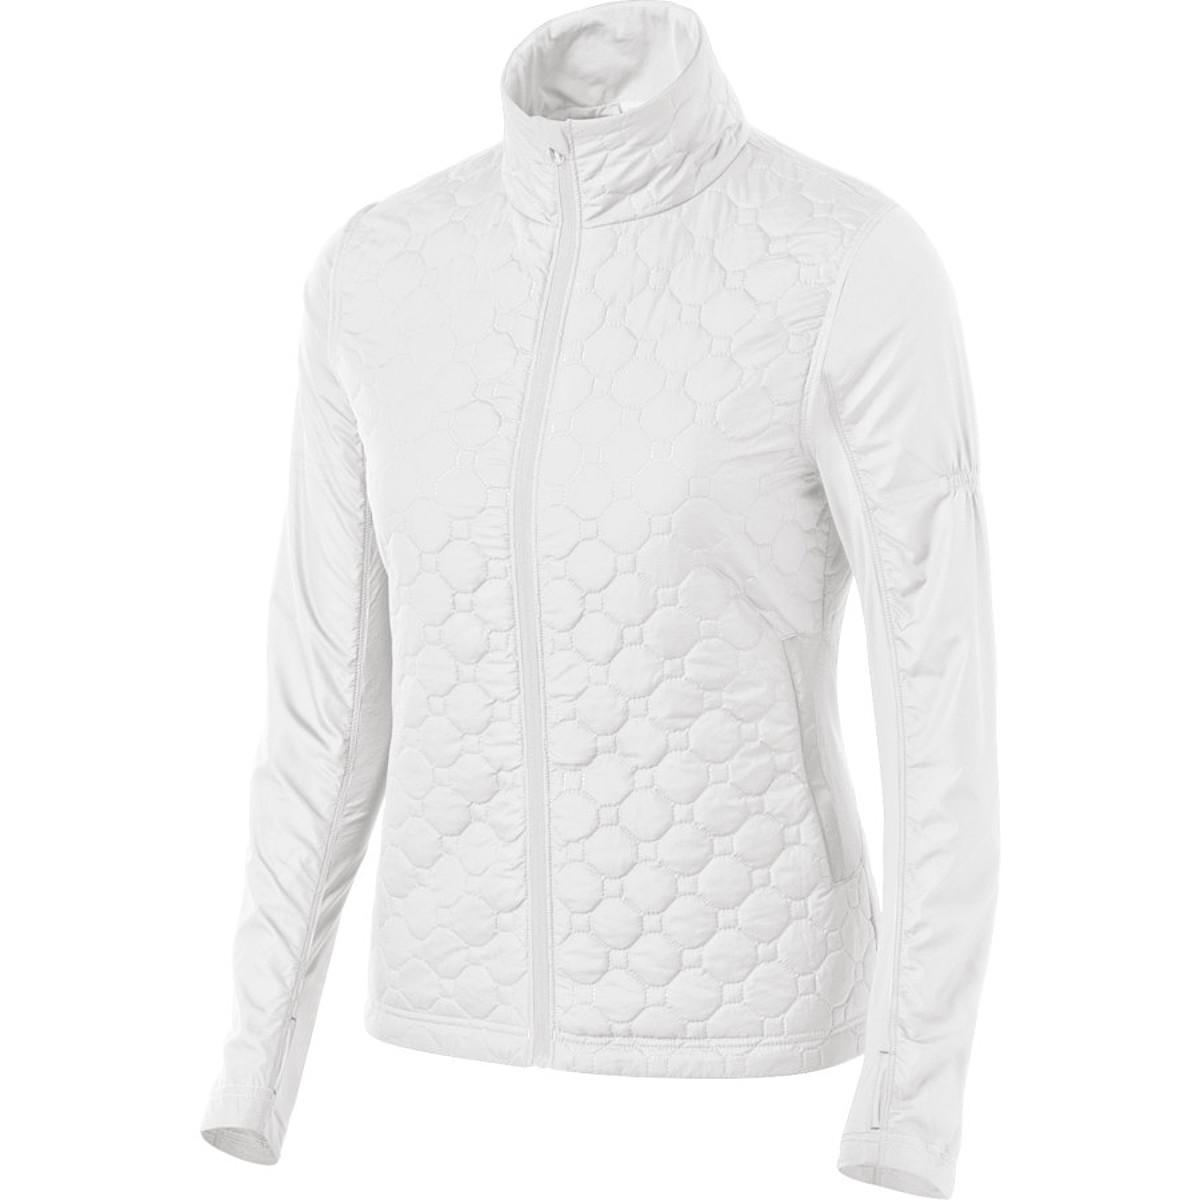 Asics Thermo Windblocker Jacket